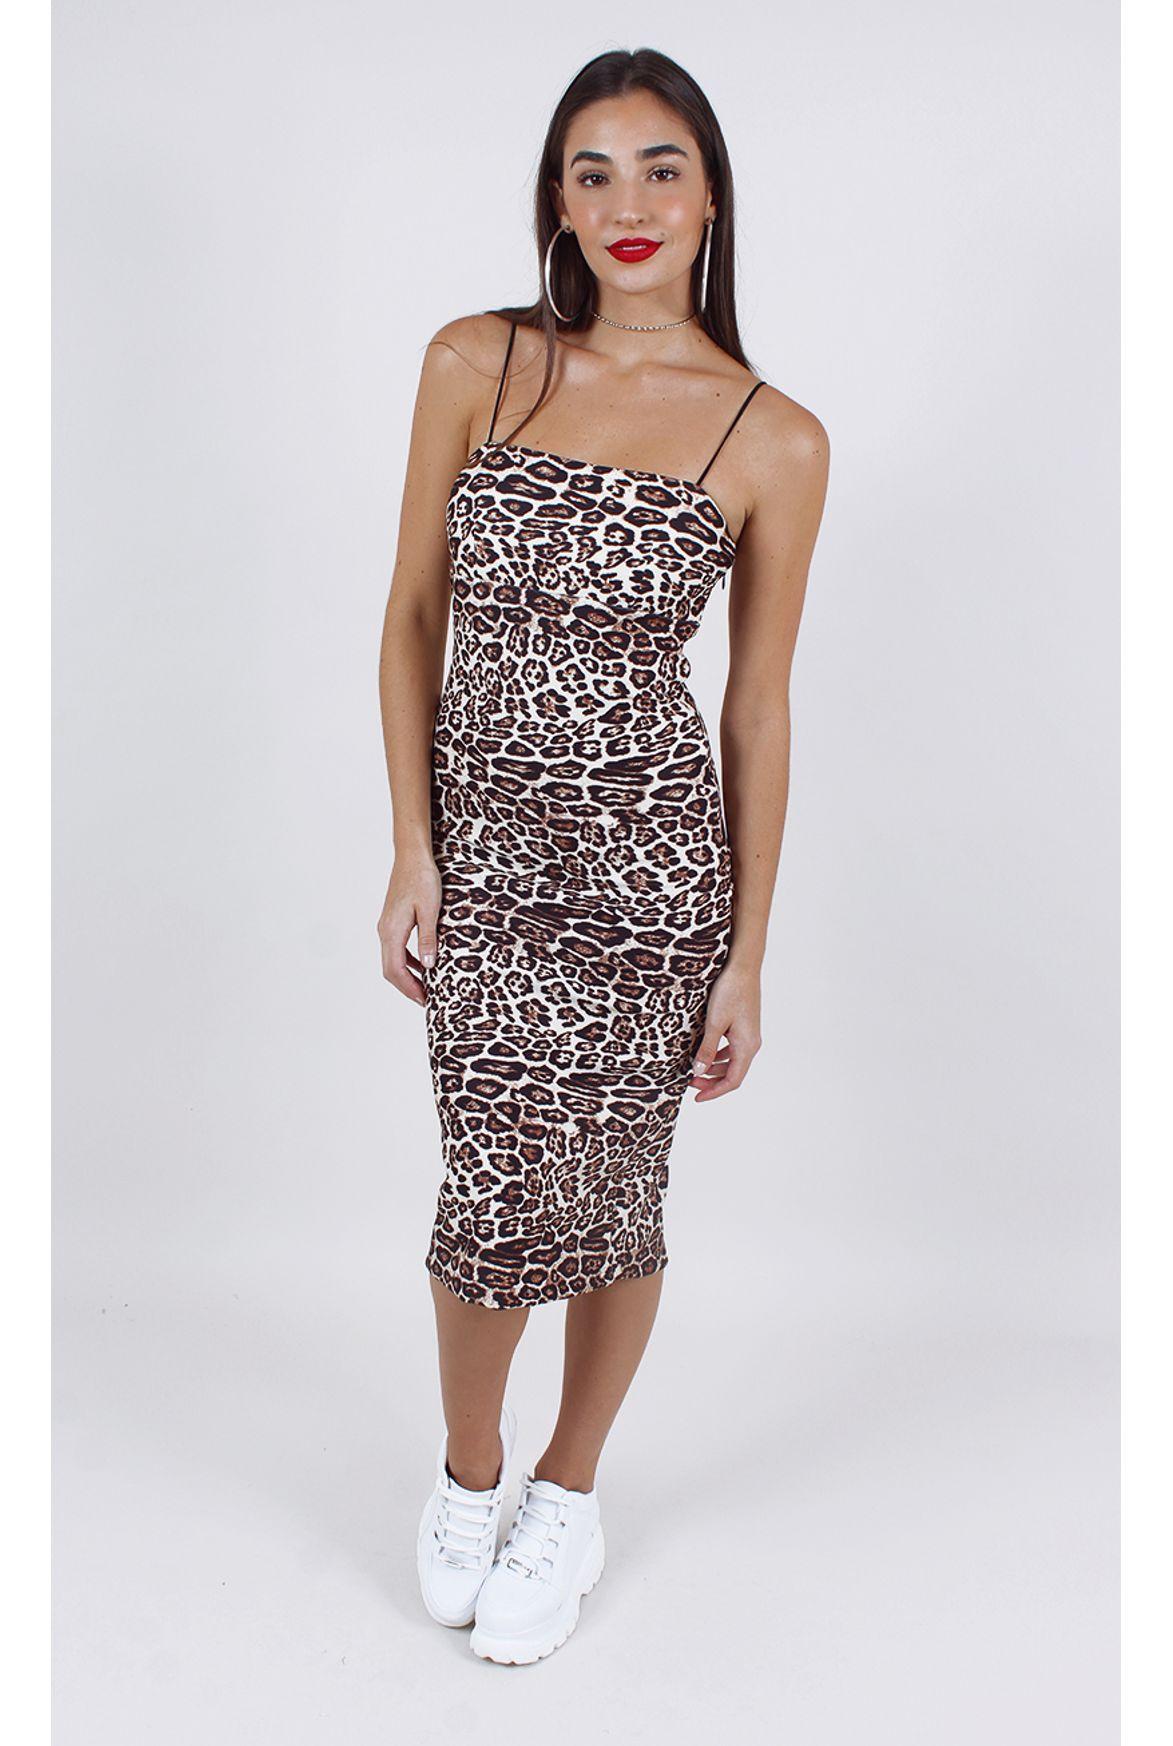 307cade304 vestido animal print midi estampa - Fashion Closet